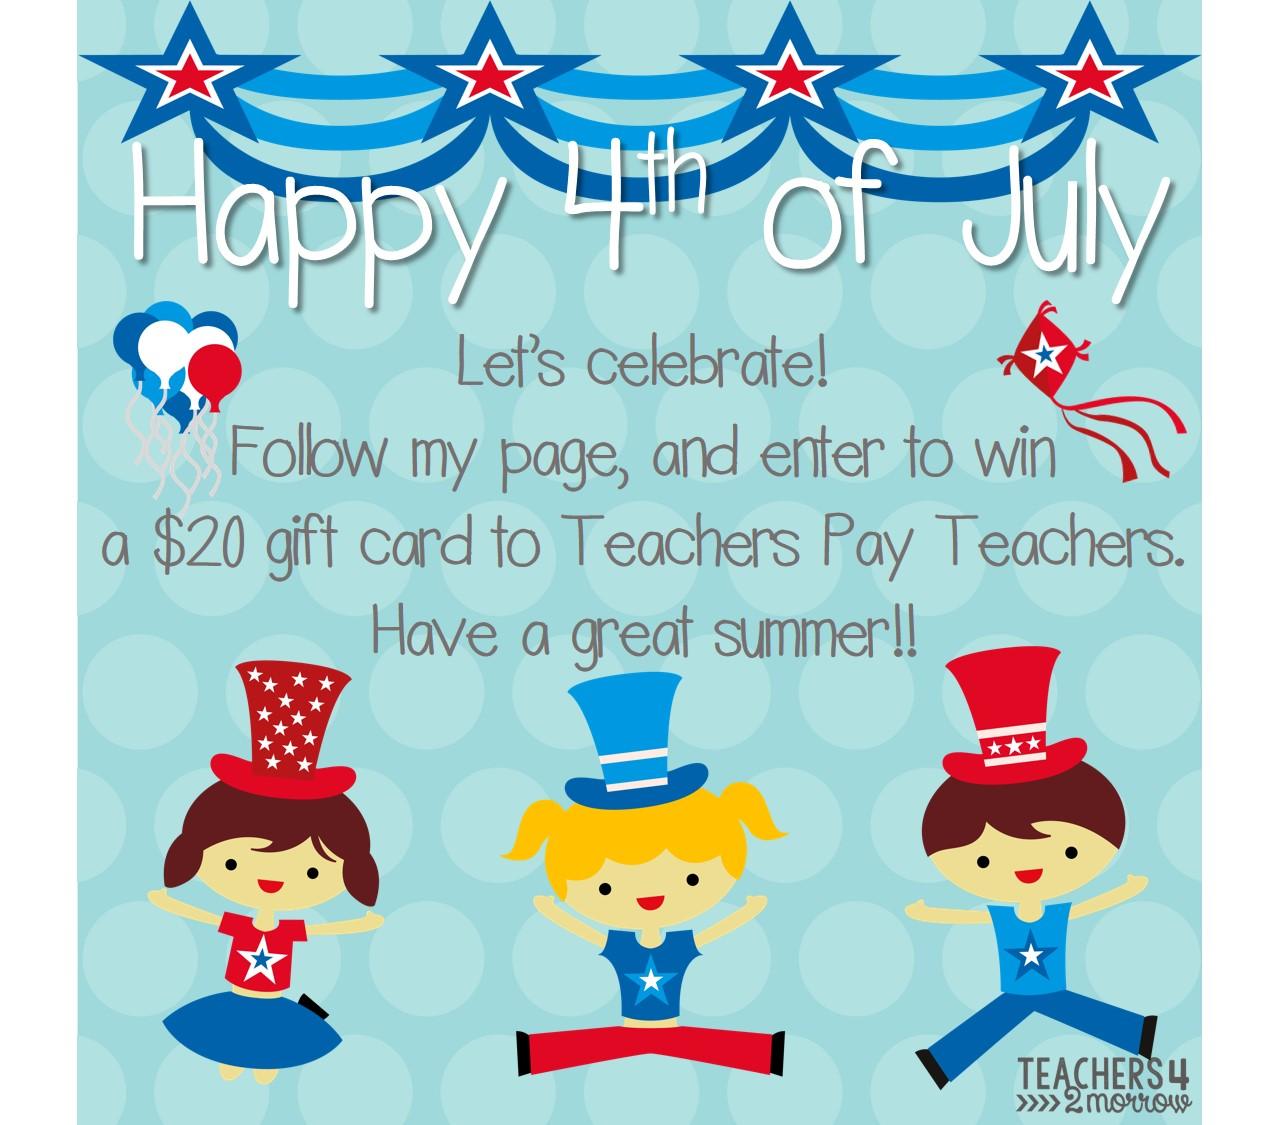 teachers4.2morrow: July 2015